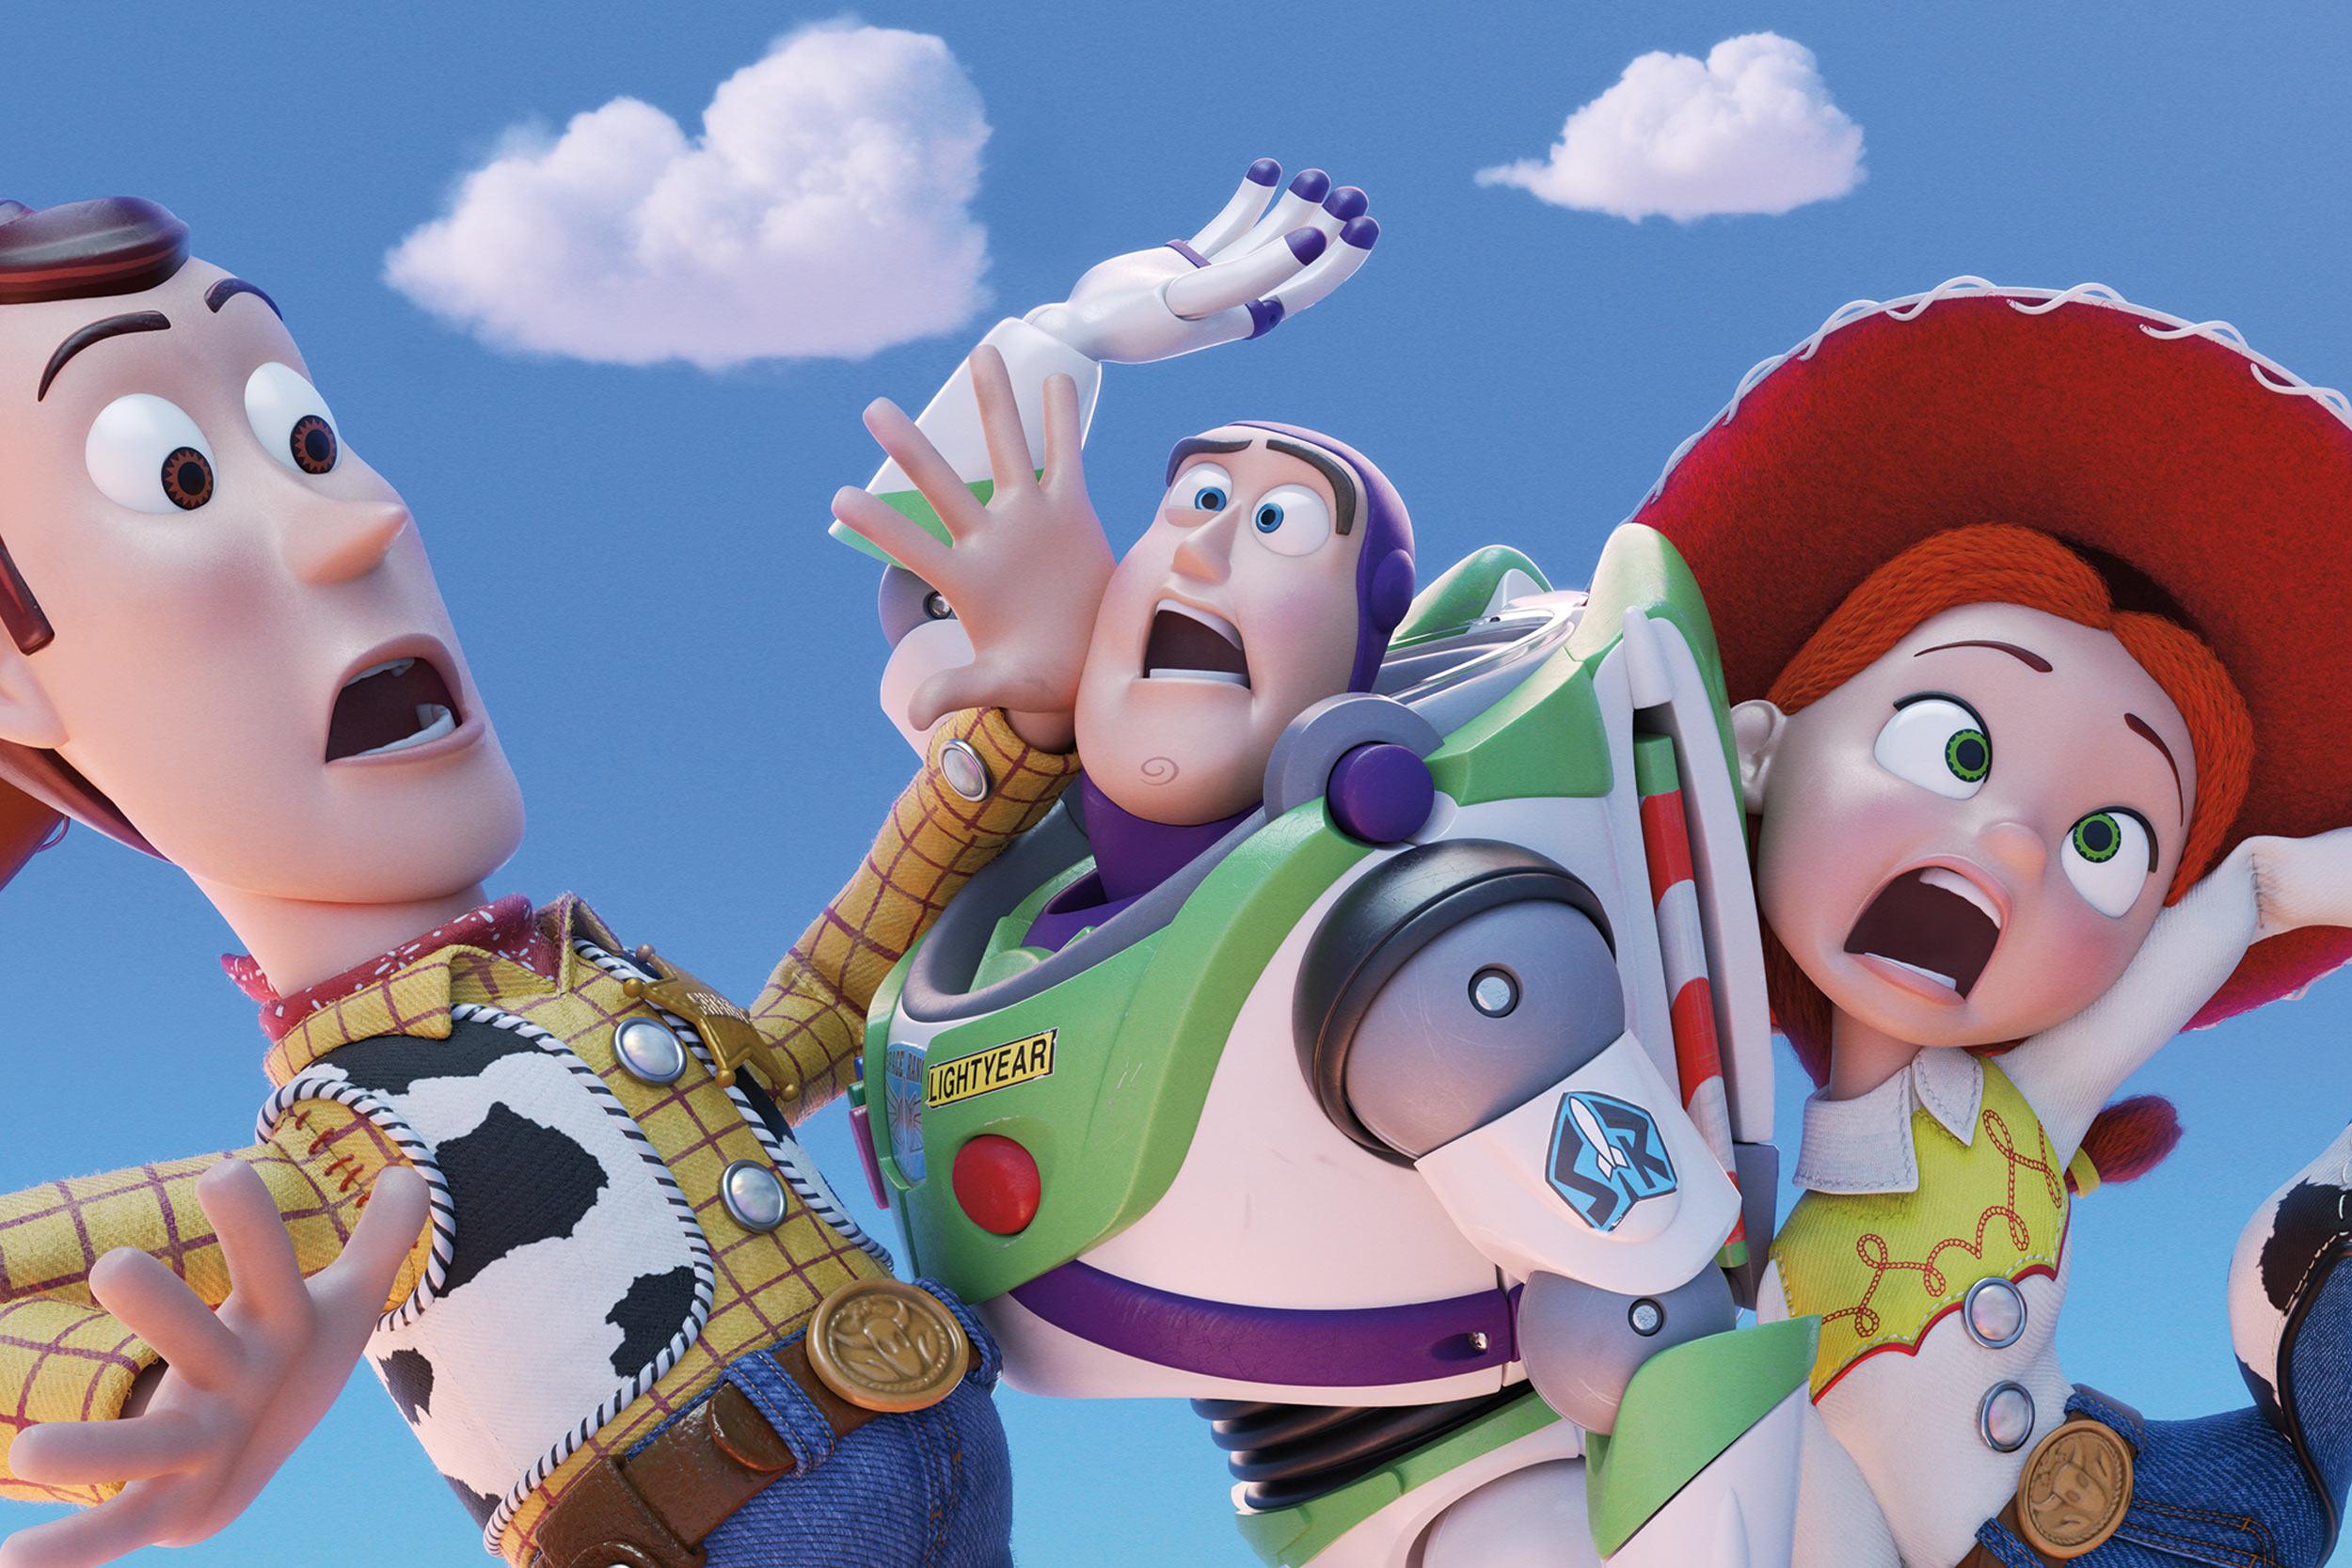 Pixar Animation Studios